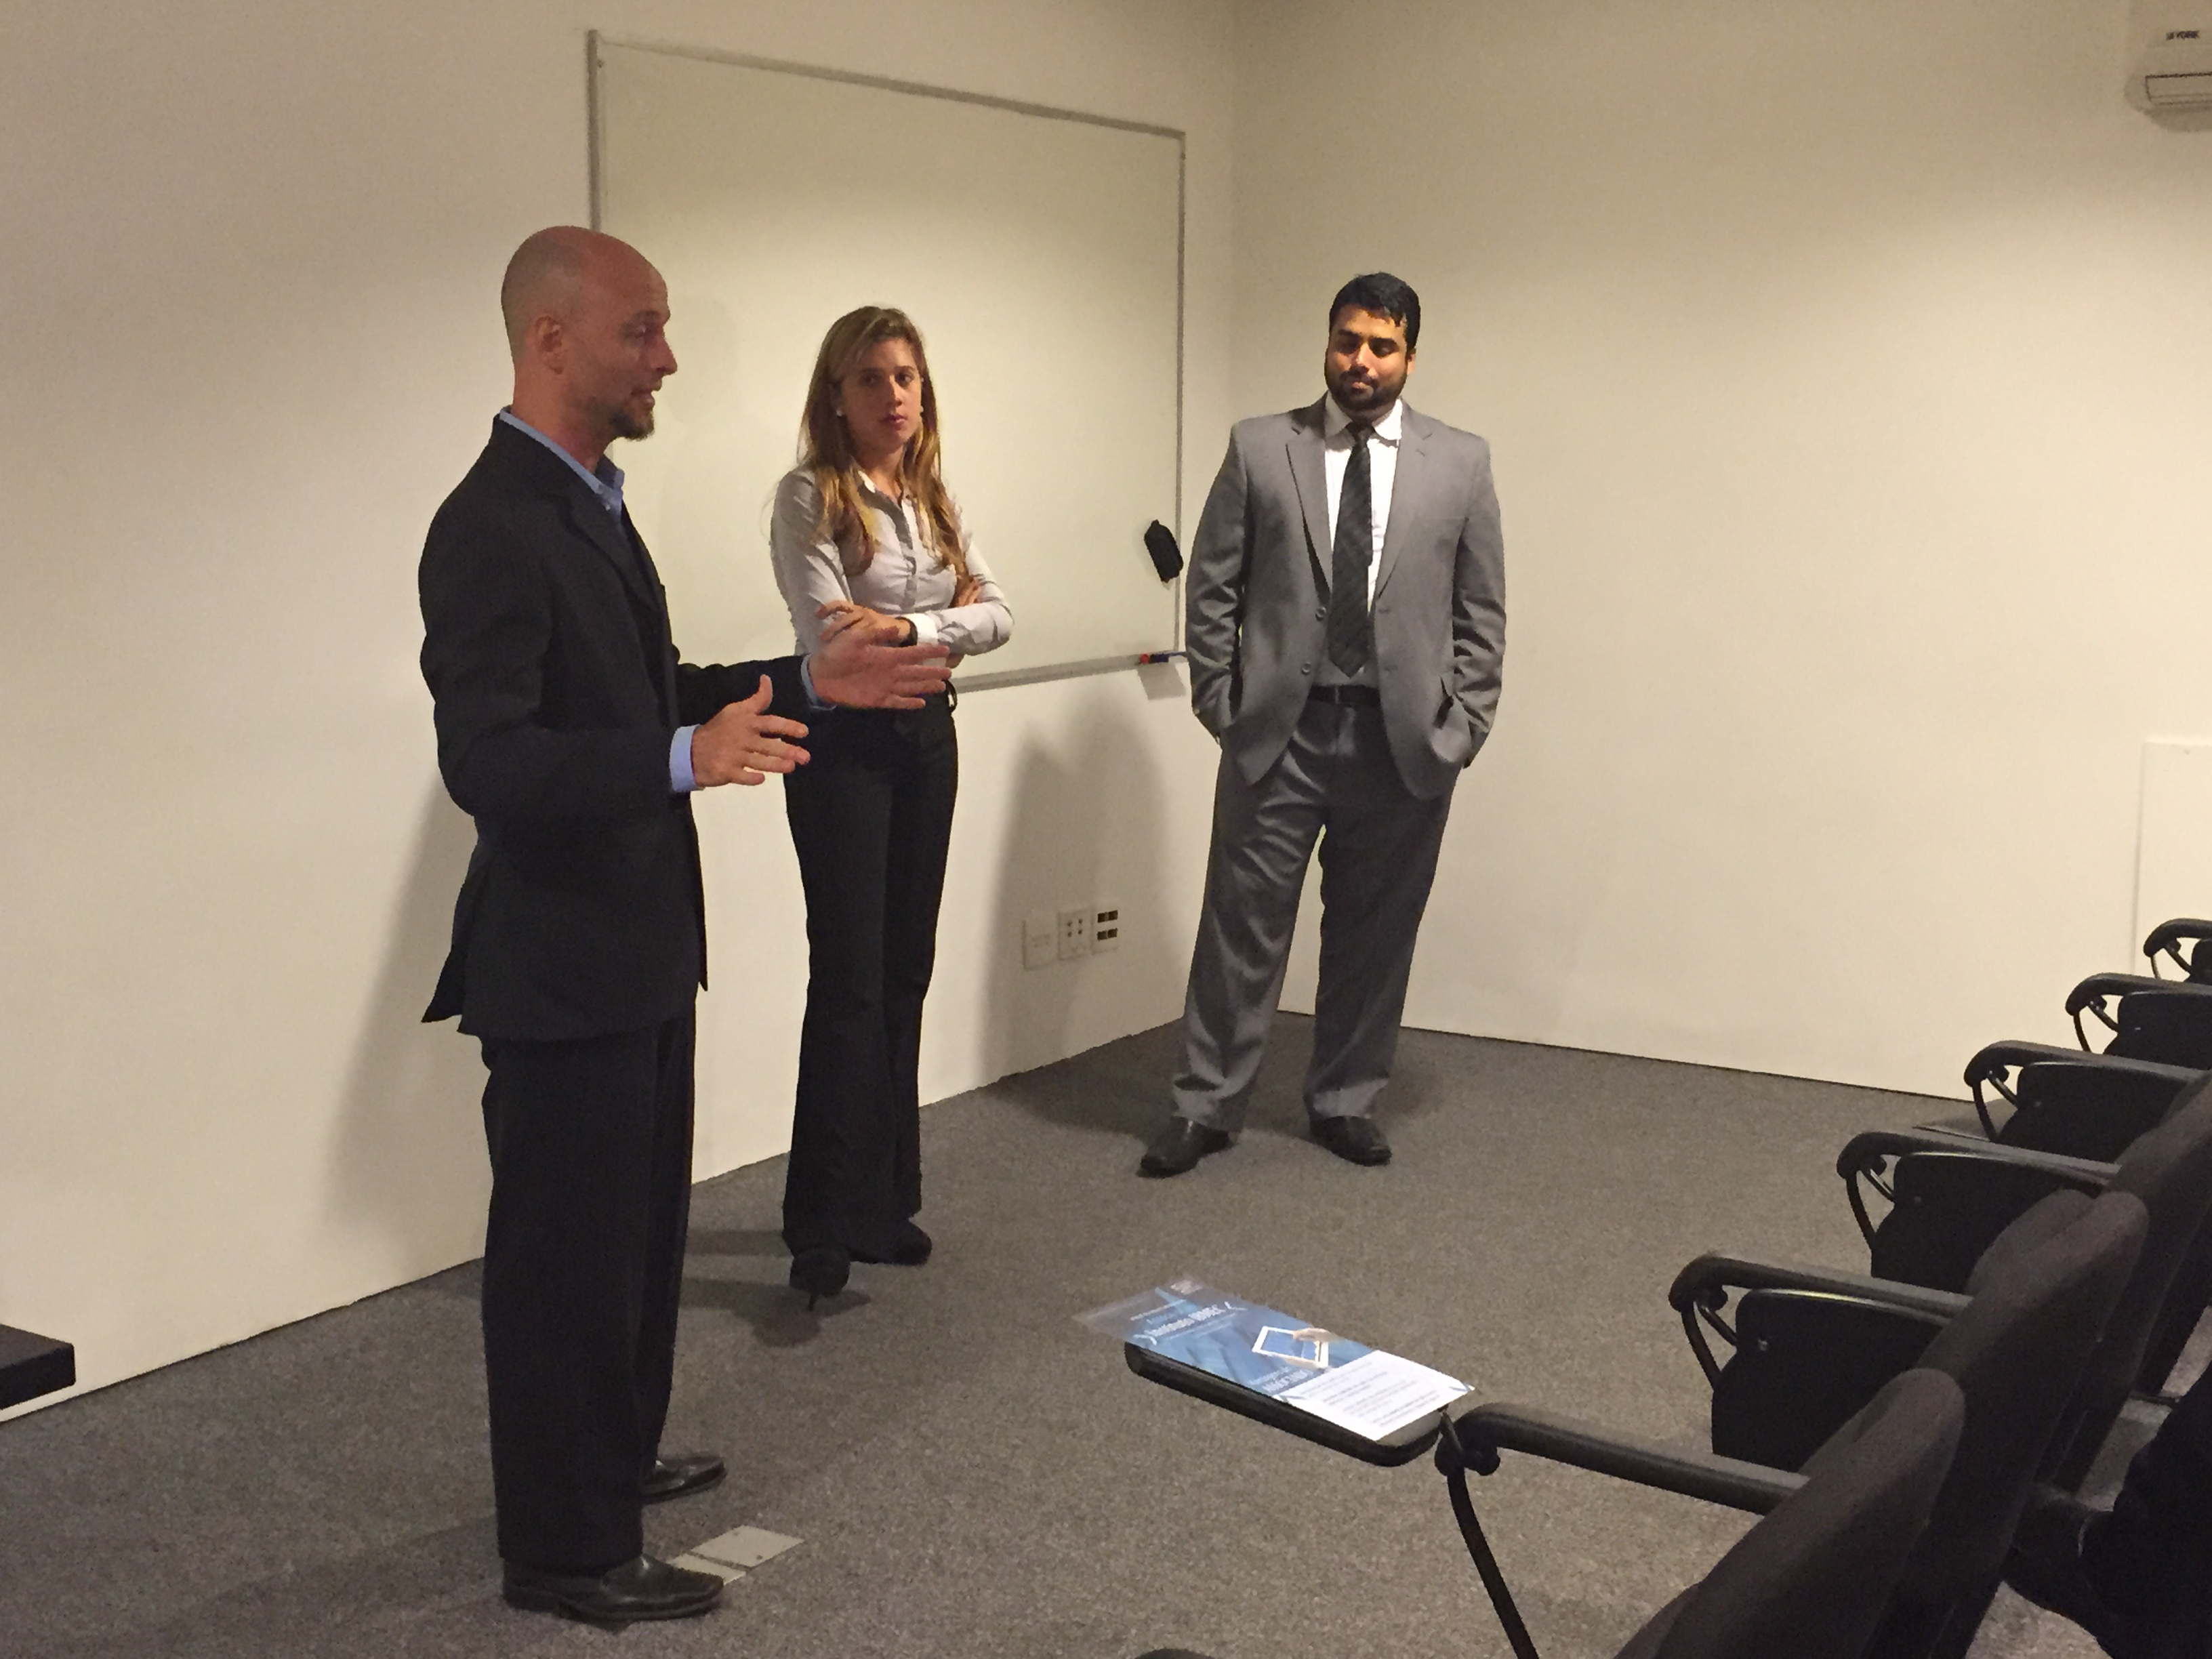 Luiz Guilherme Guedes, Marcella Blok e Daniel Barreto - IBMEC Talks #1